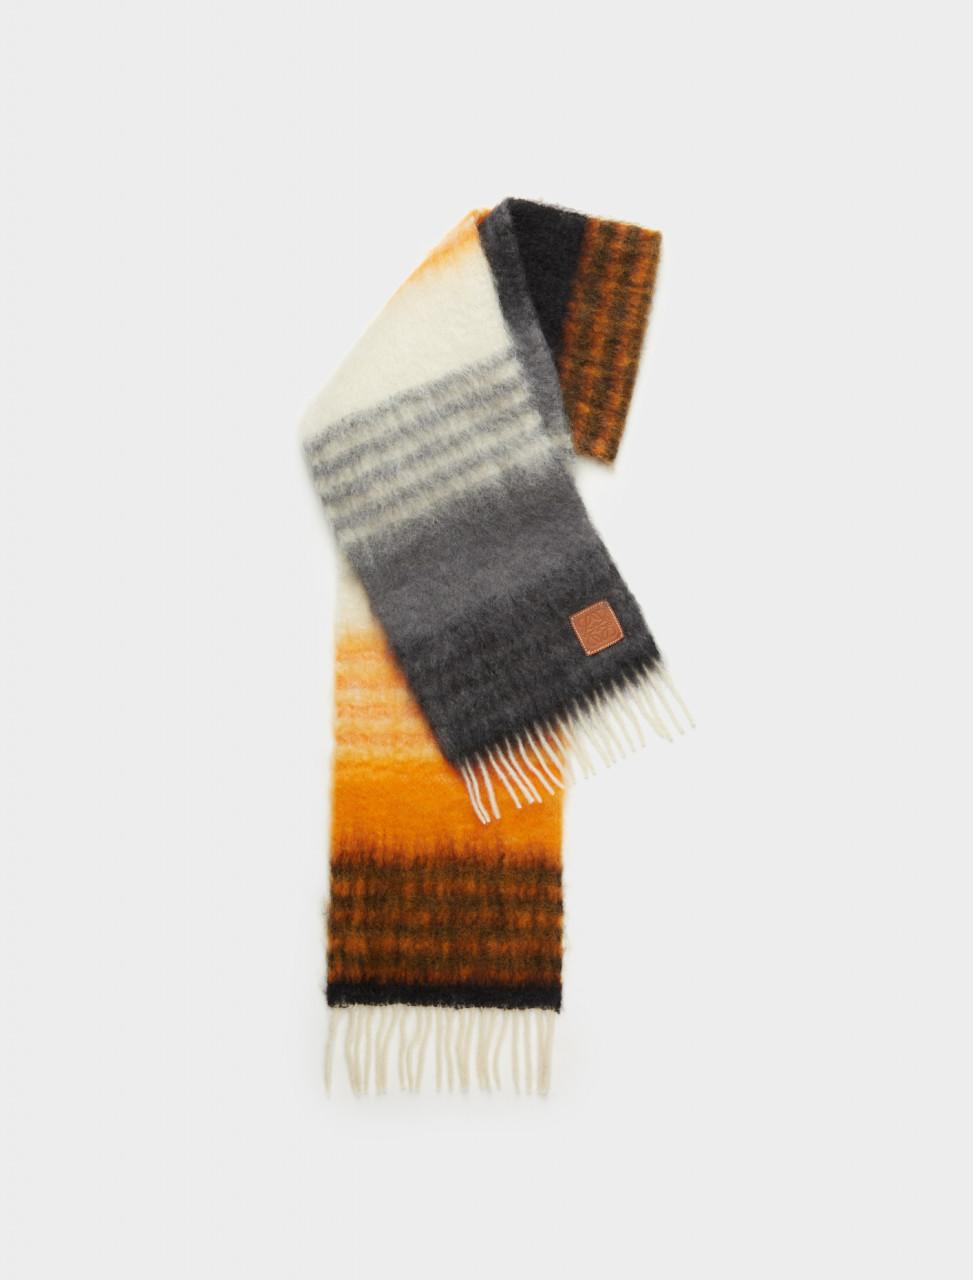 Stripe Scarf in Black, Orange & Beige